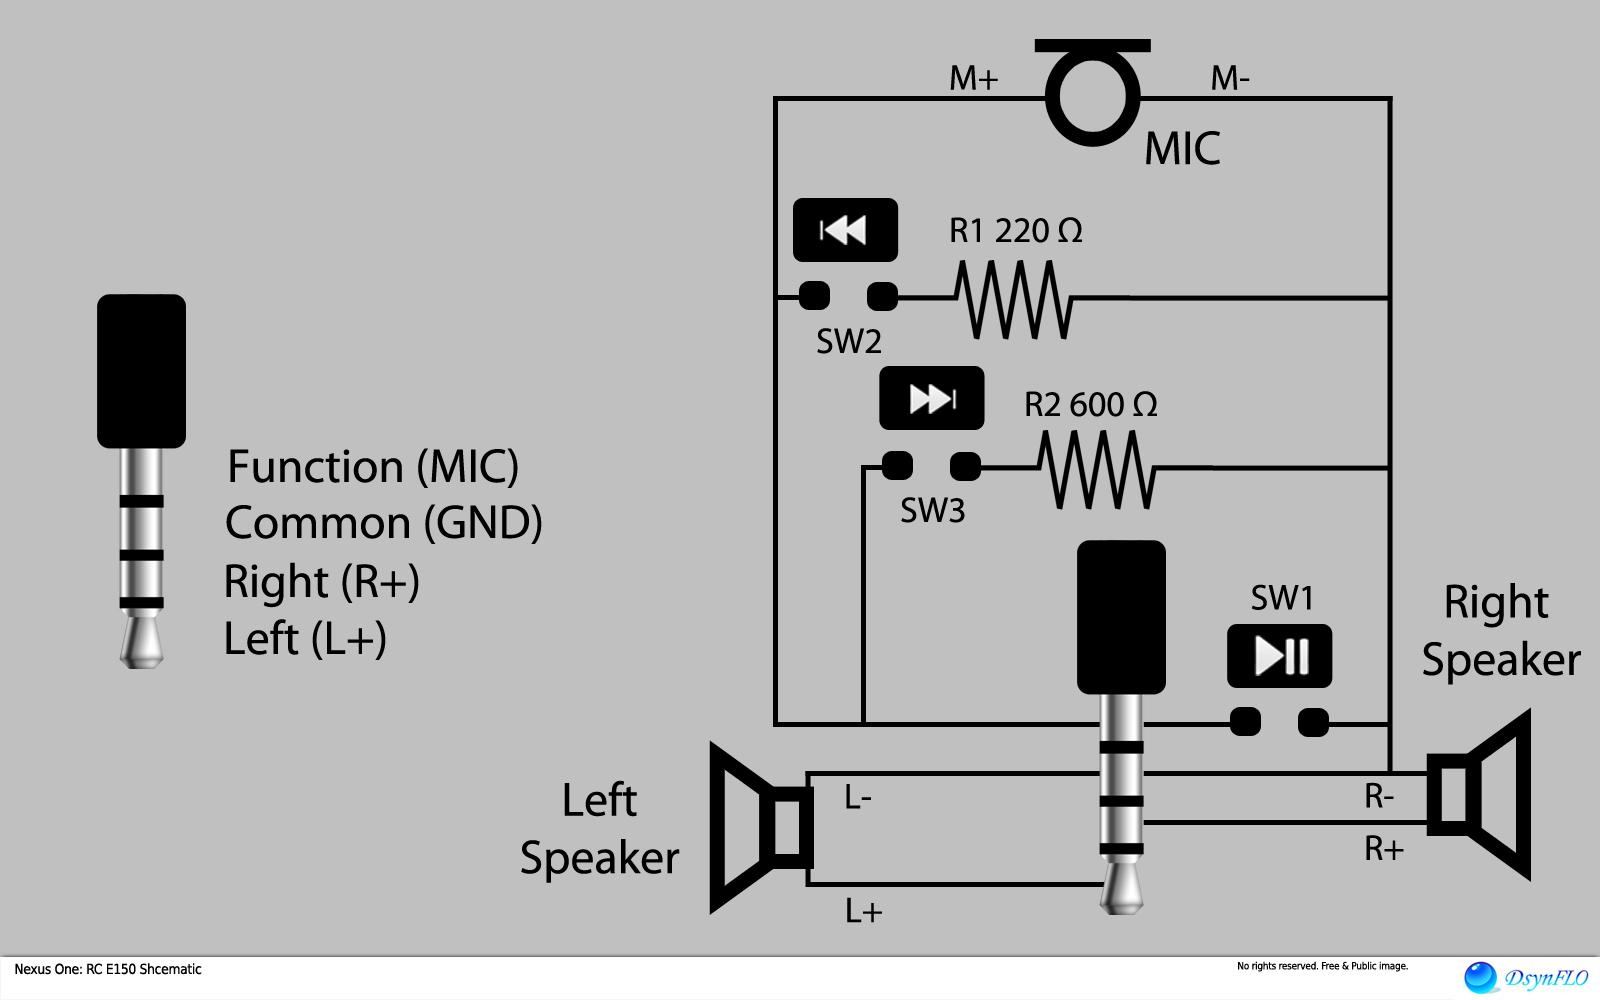 Uniden Microphone Wiring Diagram on motorola microphone wiring, realistic microphone wiring, kenwood microphone wiring, yaesu microphone wiring, icom microphone wiring, cobra microphone wiring, ranger microphone wiring, heathkit microphone wiring, alinco microphone wiring, wilson microphone wiring, emerson microphone wiring, astatic microphone wiring, ten tec microphone wiring,